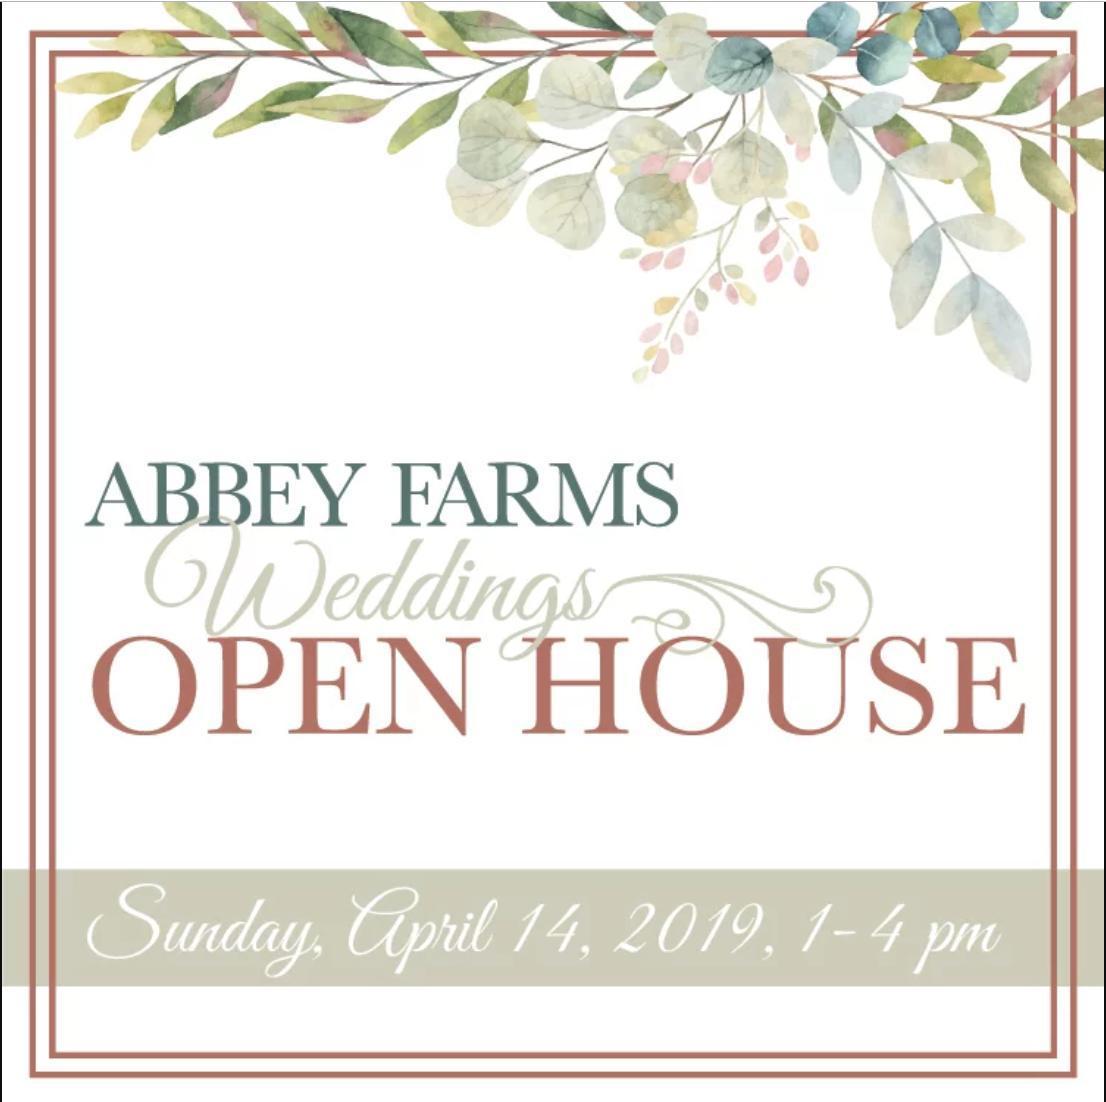 Abbey Farms Wedding Open House - April 2019